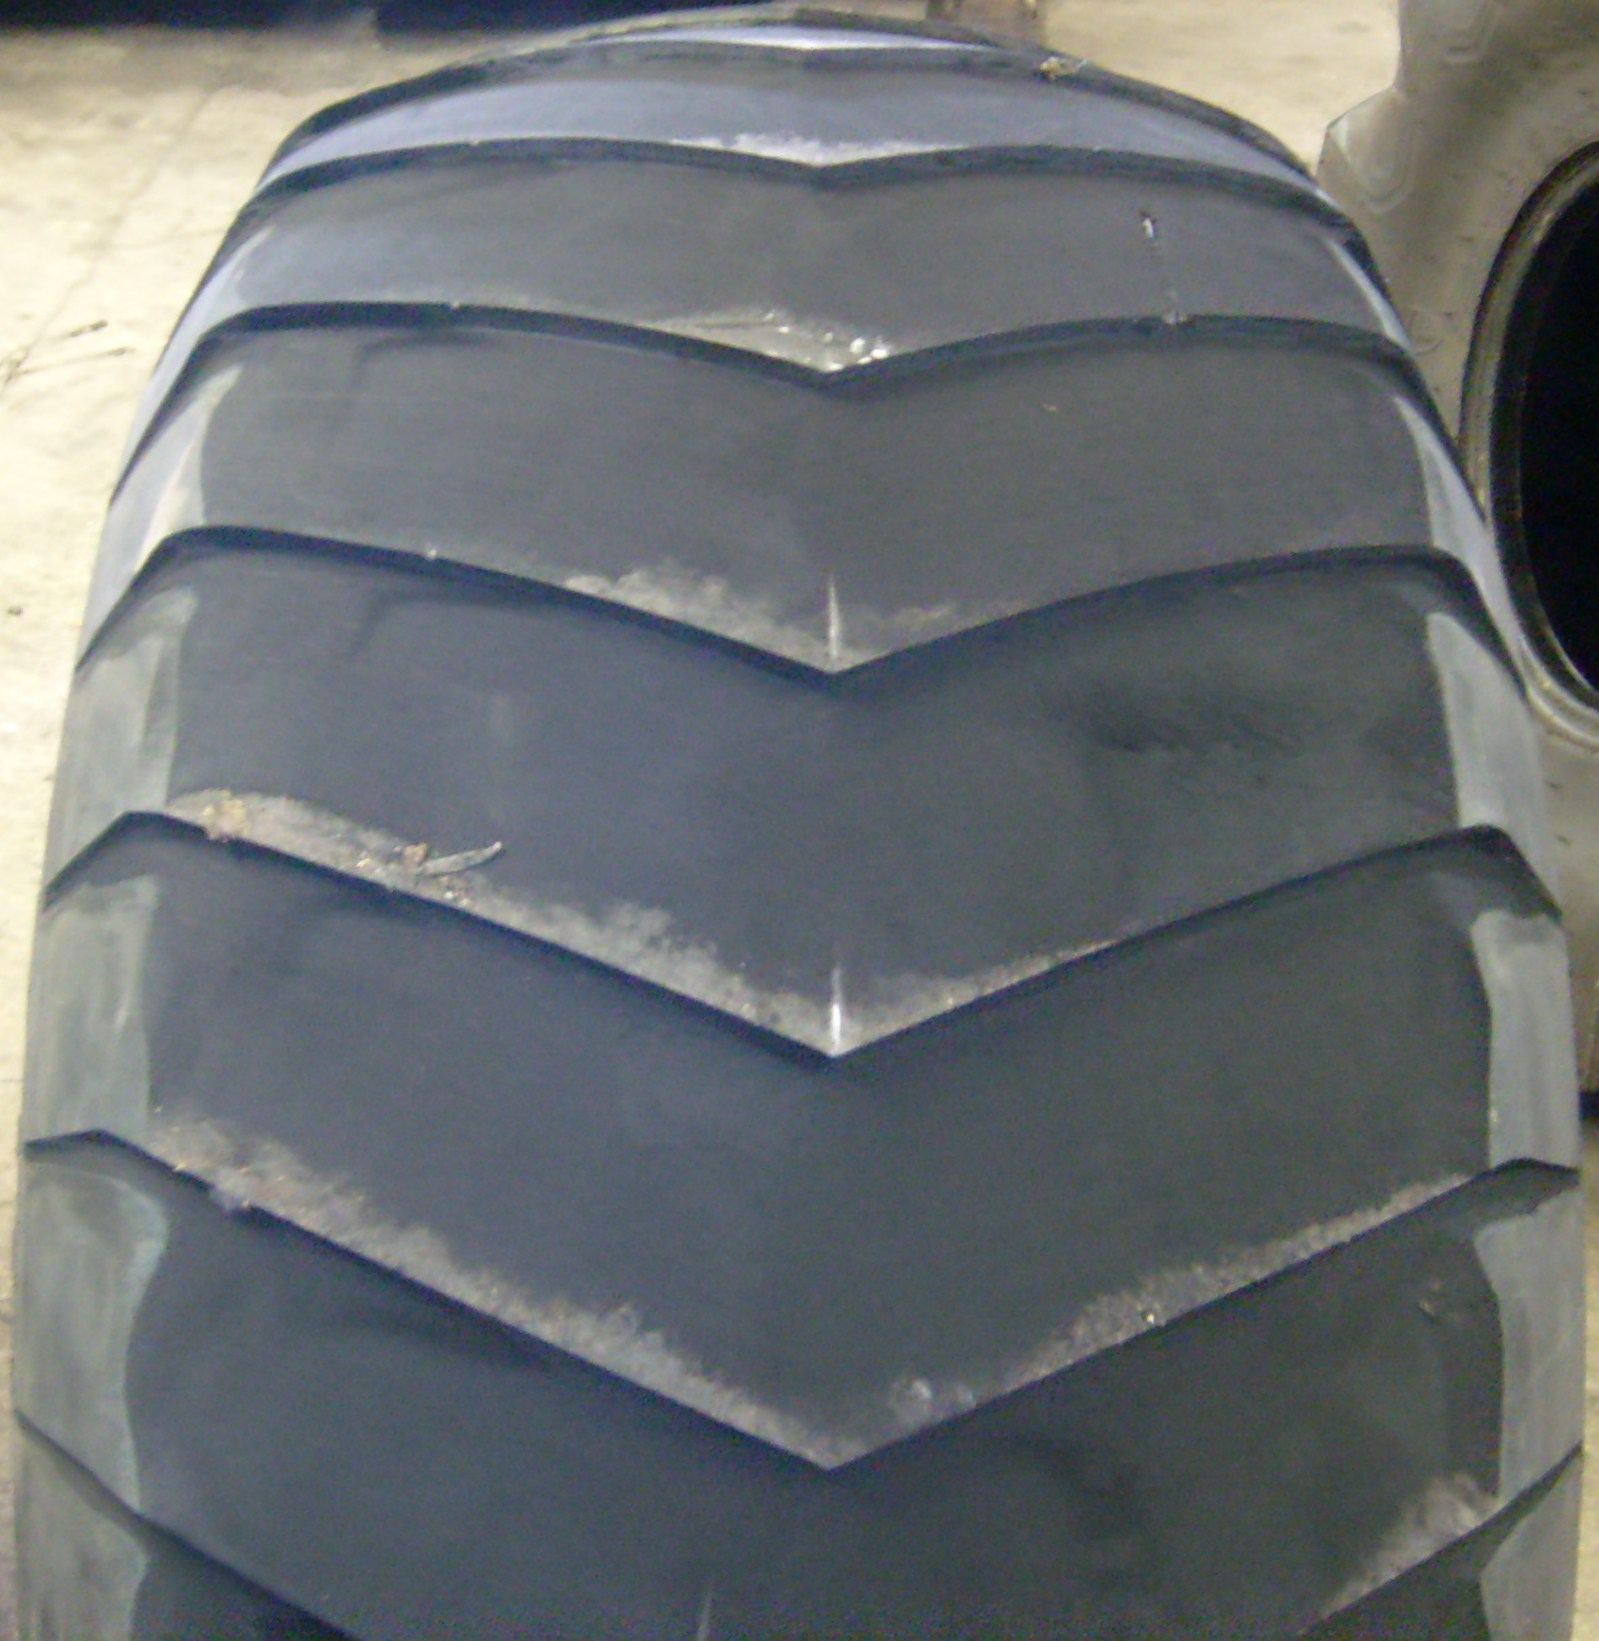 Cut Garden Tractor Pulling Tires : Galleryoftires